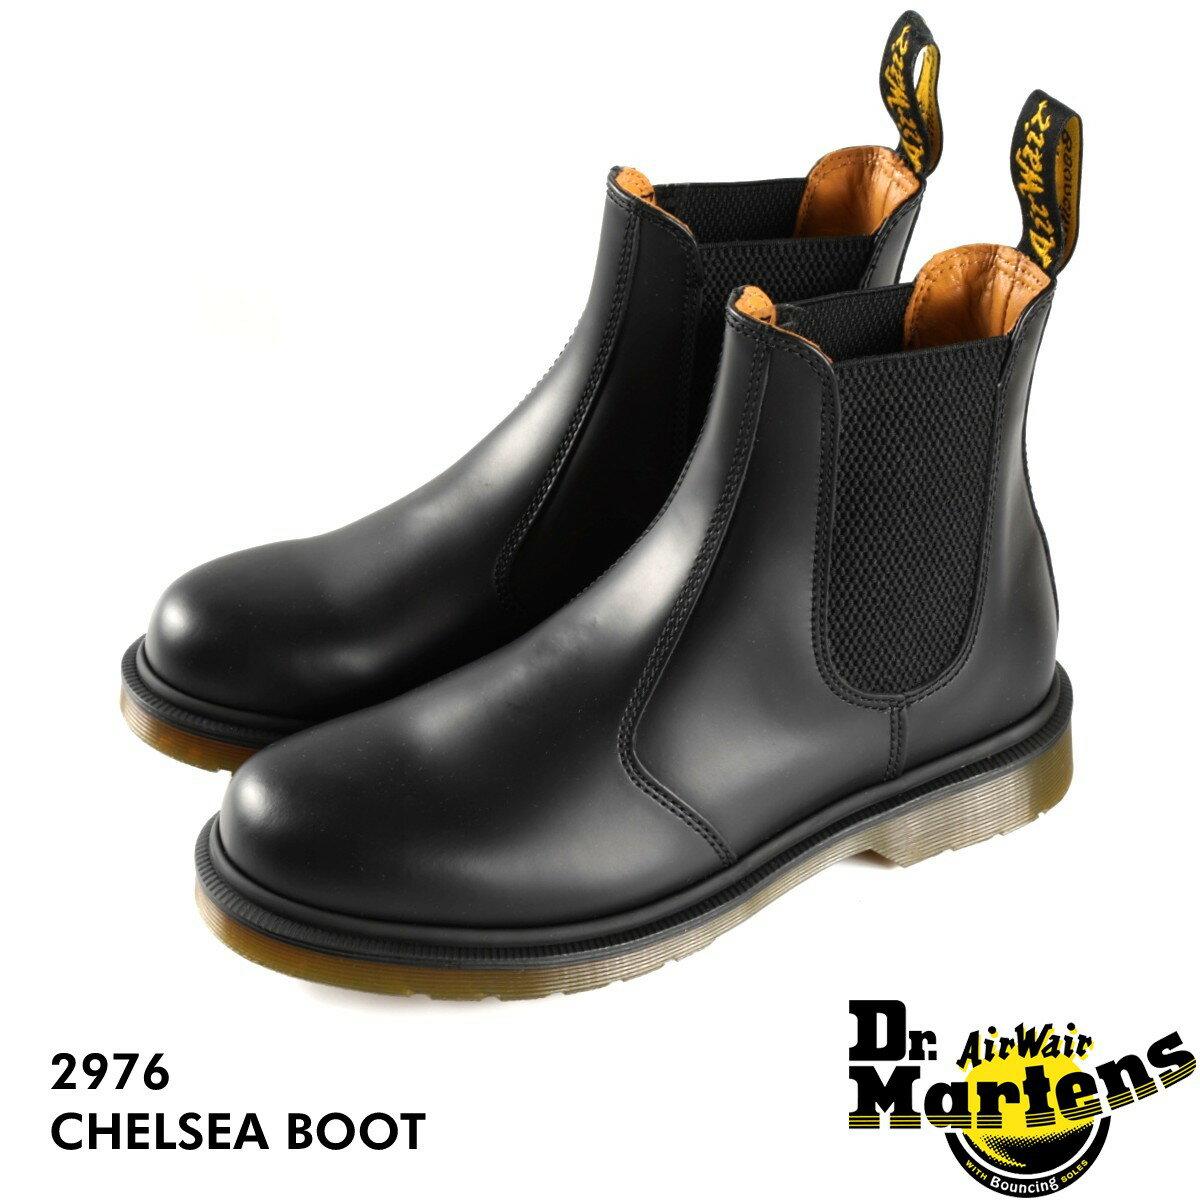 Dr.Martens CHELSEA BOOT 2976 【メンズ】【レディース】 ドクターマーチン チェルシー ブーツ BLACK 黒 サイドゴア